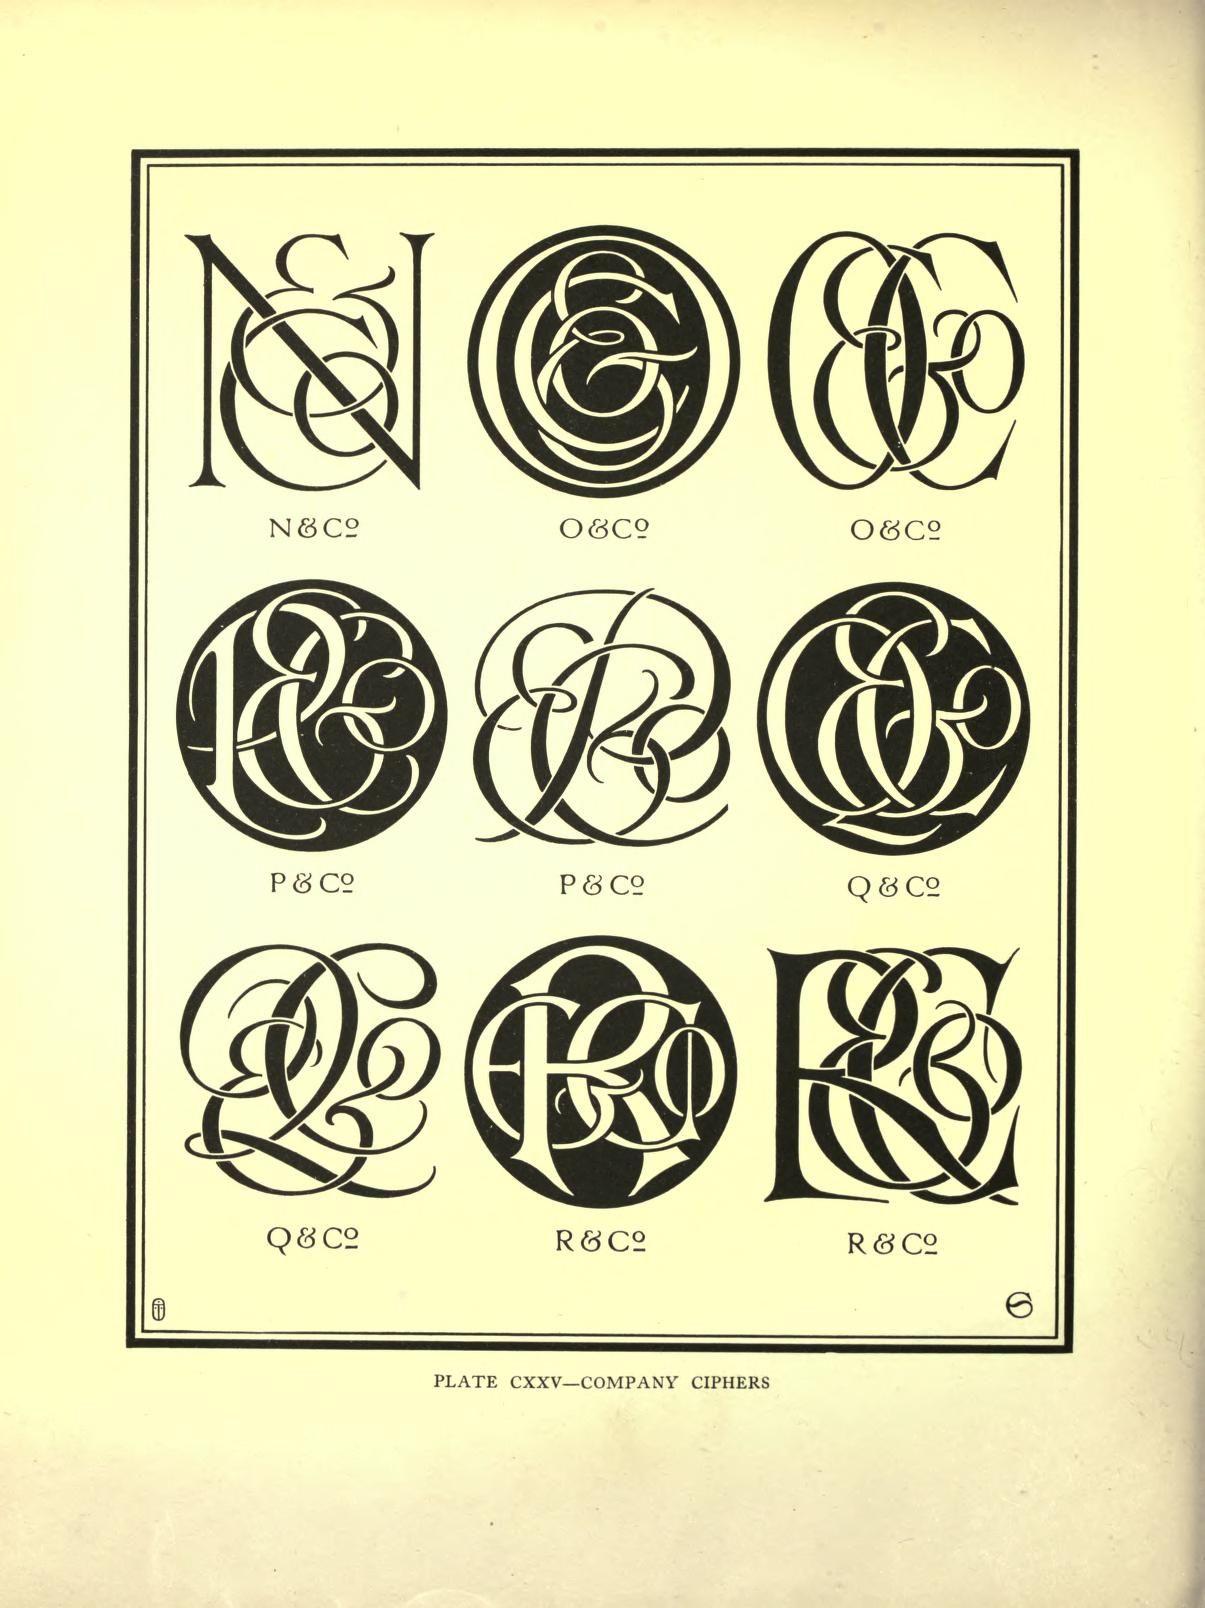 Monograms ciphers monograms pinterest monograms caligraphy types of font styles monograms ciphers altavistaventures Gallery